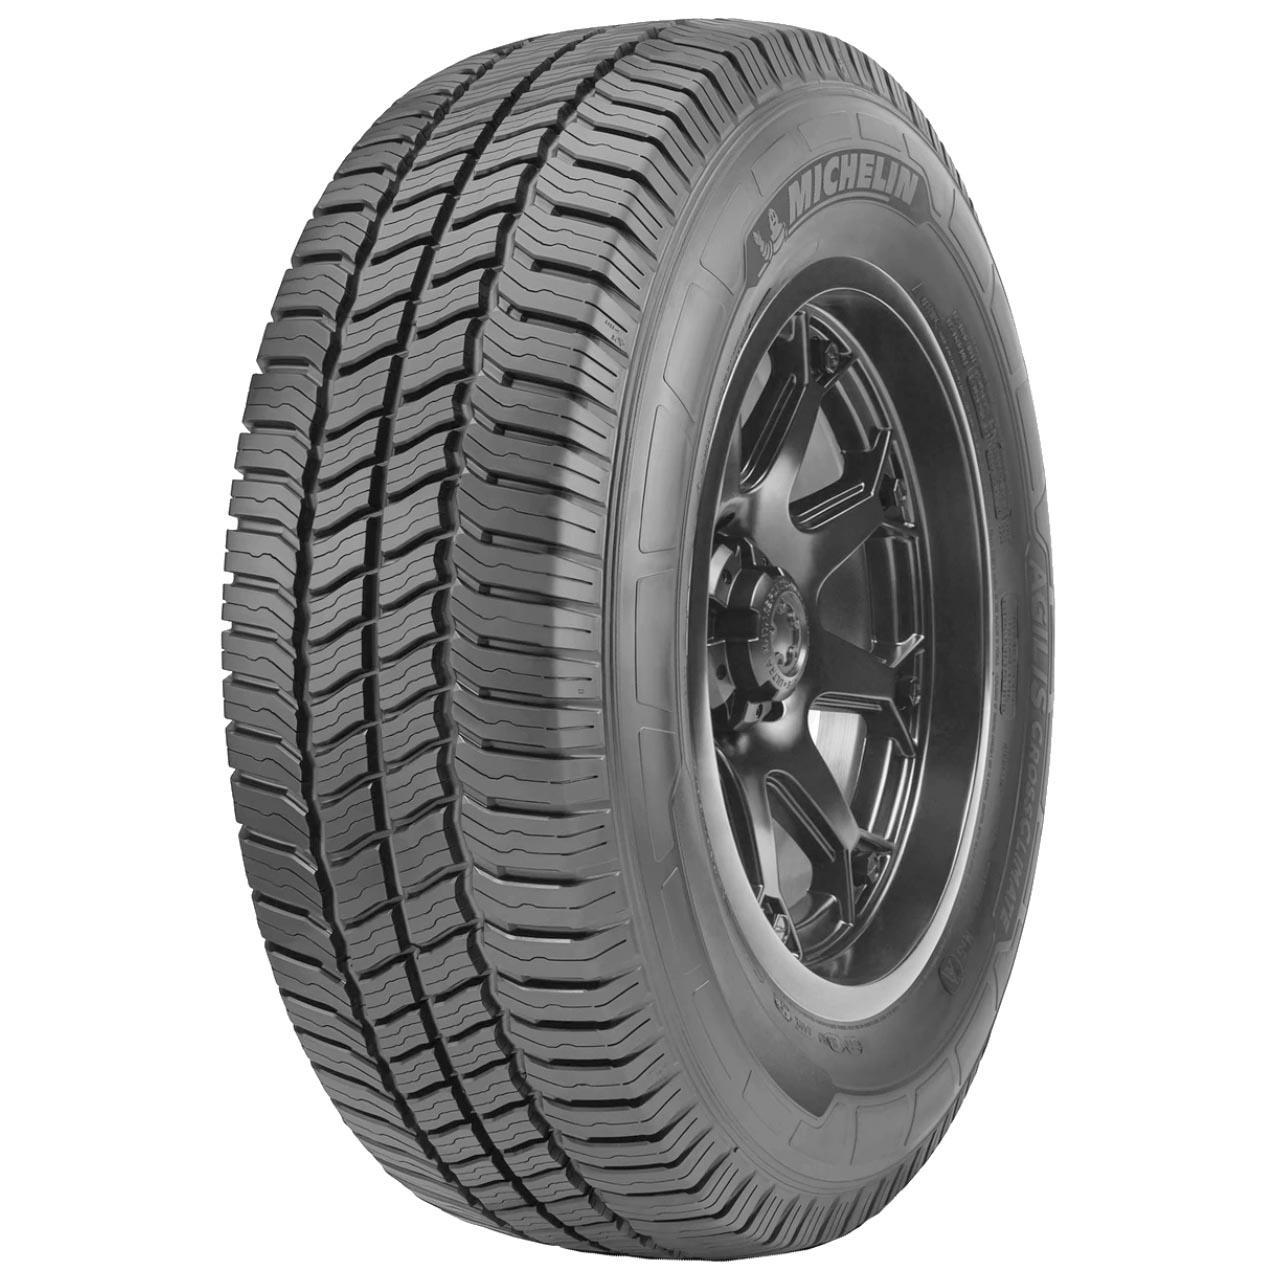 Michelin Agilis Crossclimate 205/75R16C 110/108R